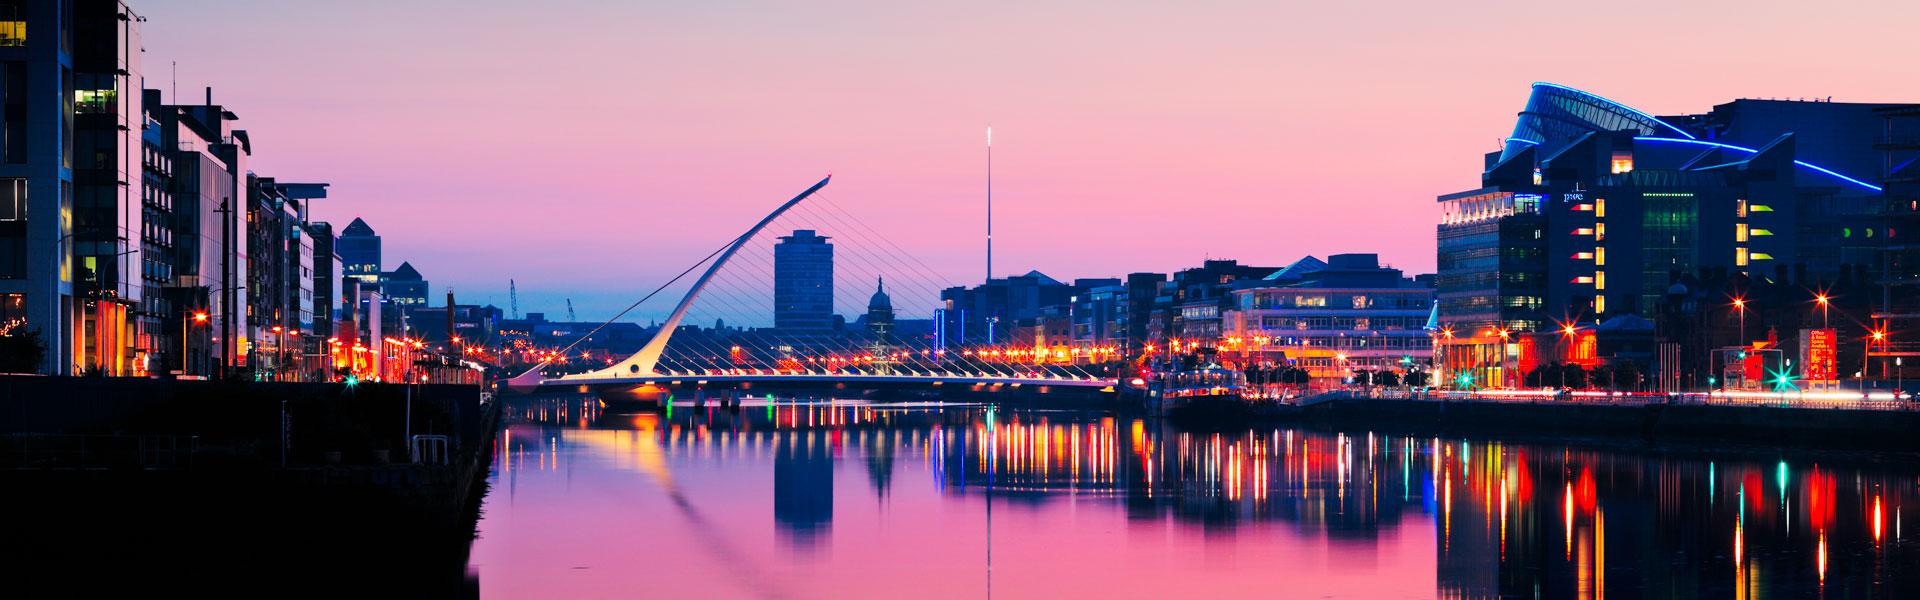 View of Dublin River Liffey at Dusk